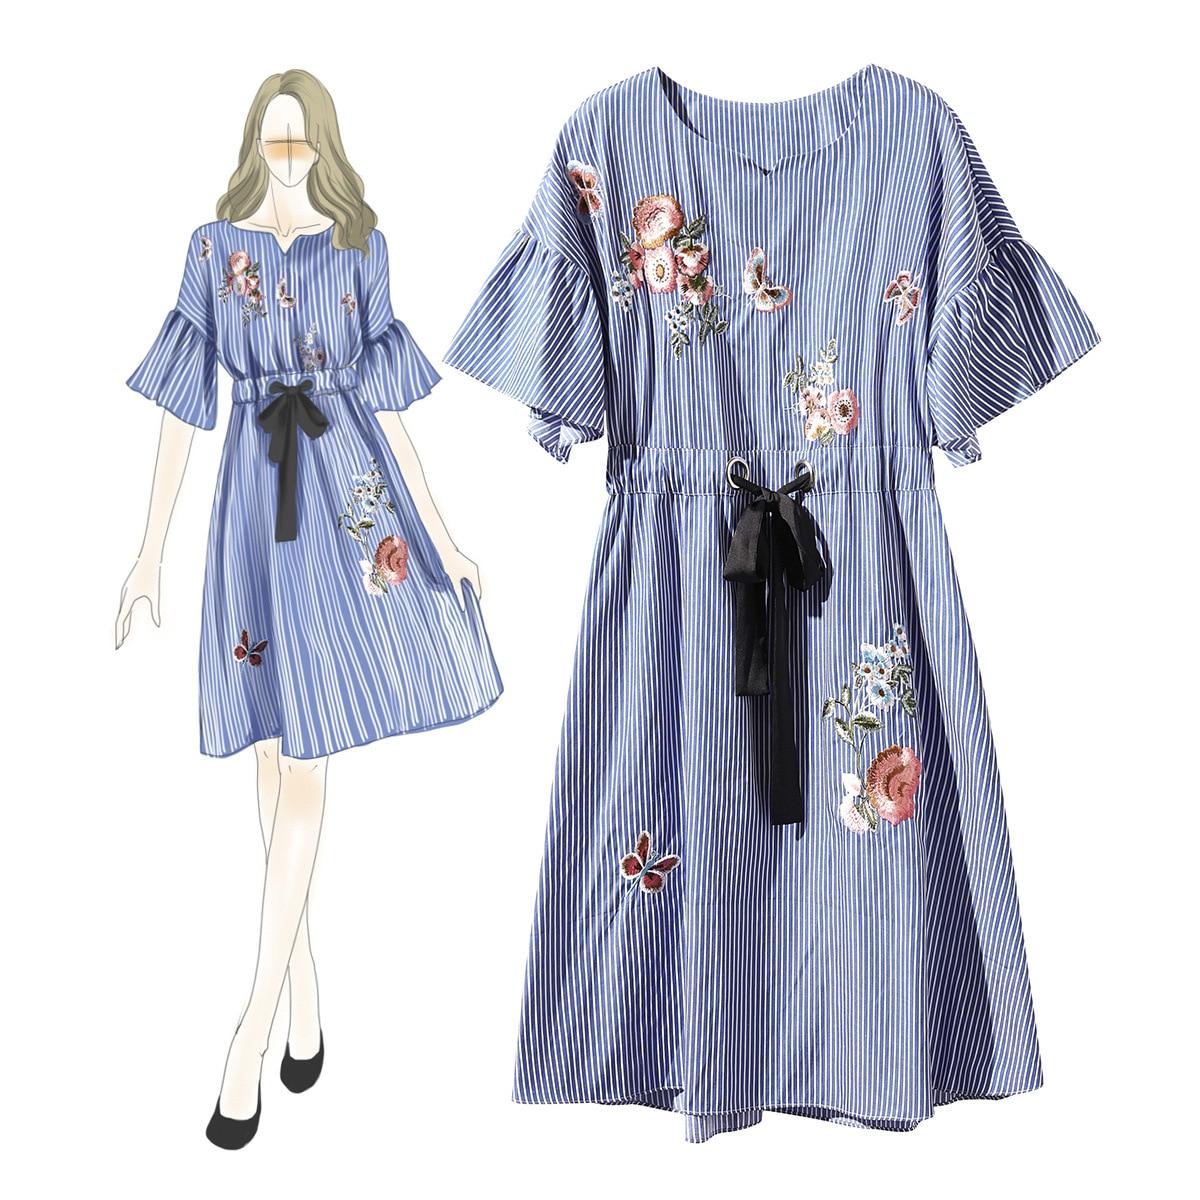 Unique Design Fashion Ladys Spring New Striped Dress Cotton Embroidery Summer Boutique Dresses for Women